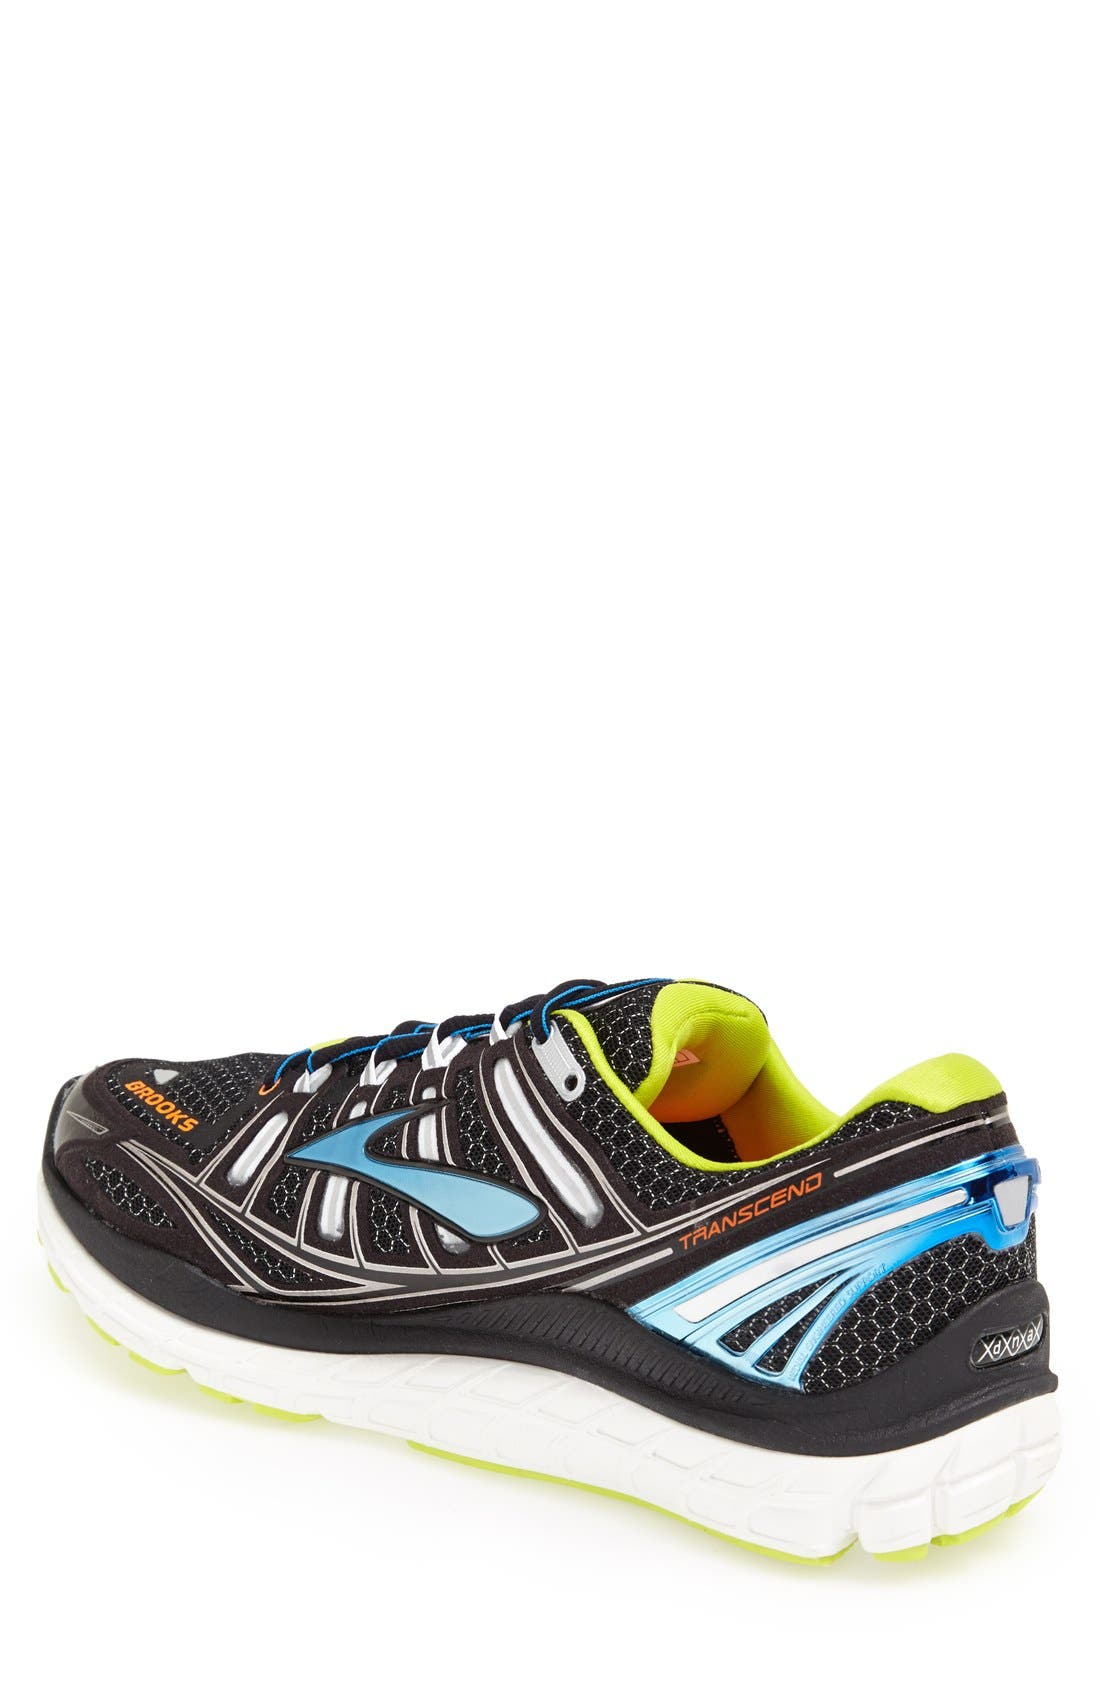 Alternate Image 2  - Brooks 'Transcend' Running Shoe (Men)